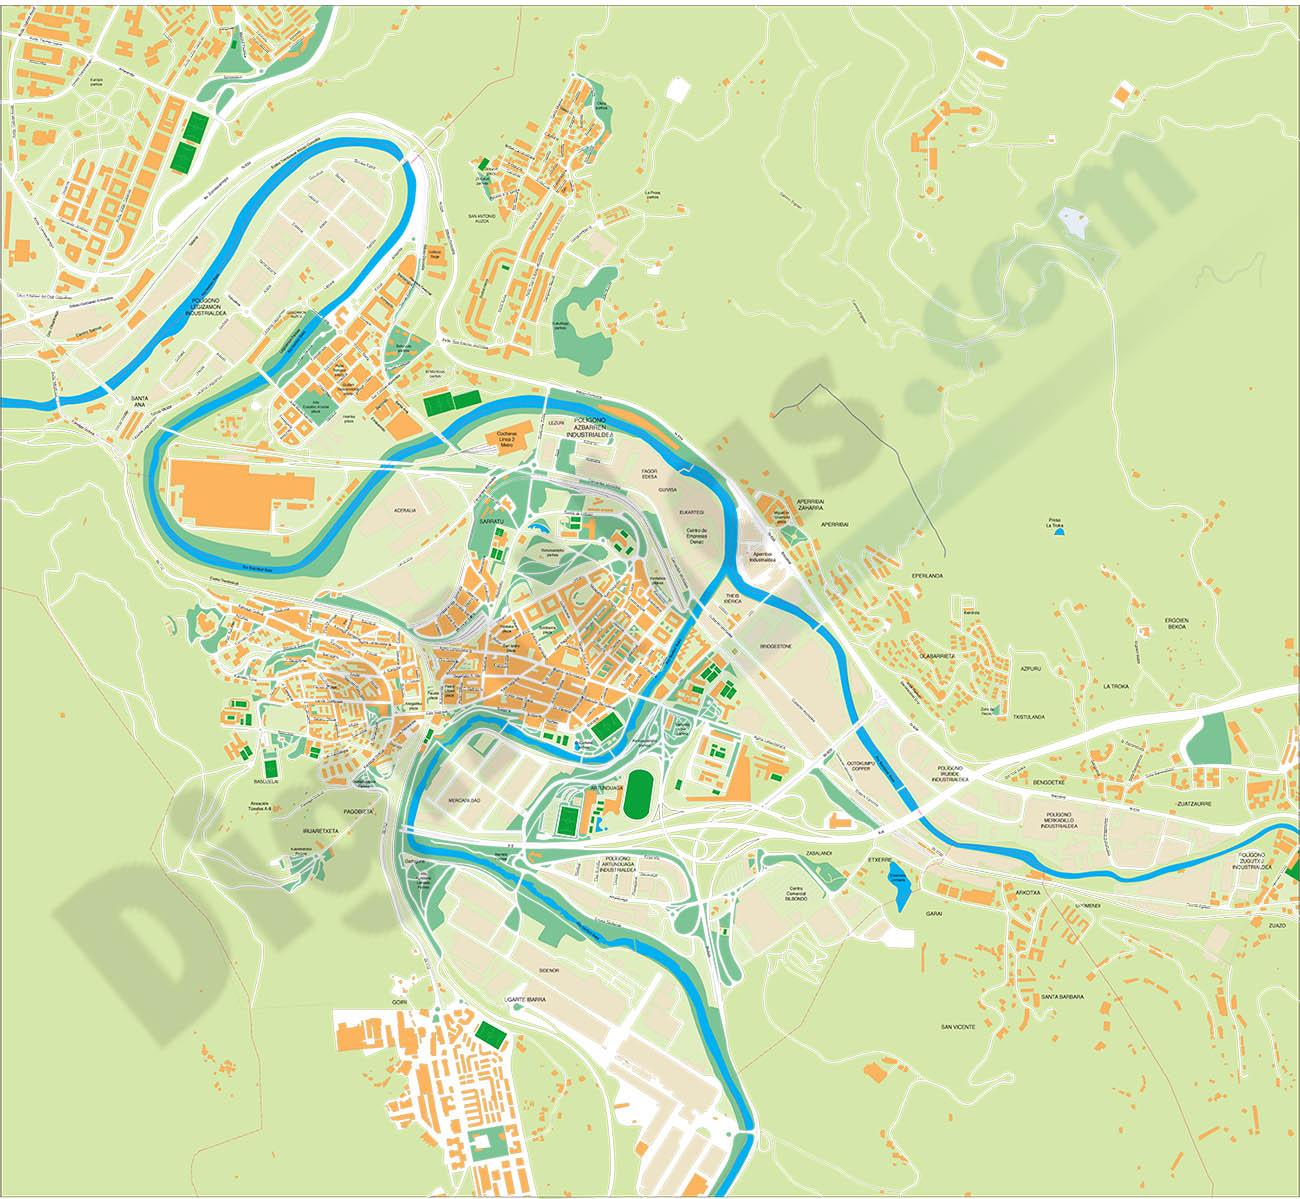 Basauri (Bizkaia) - plano callejero